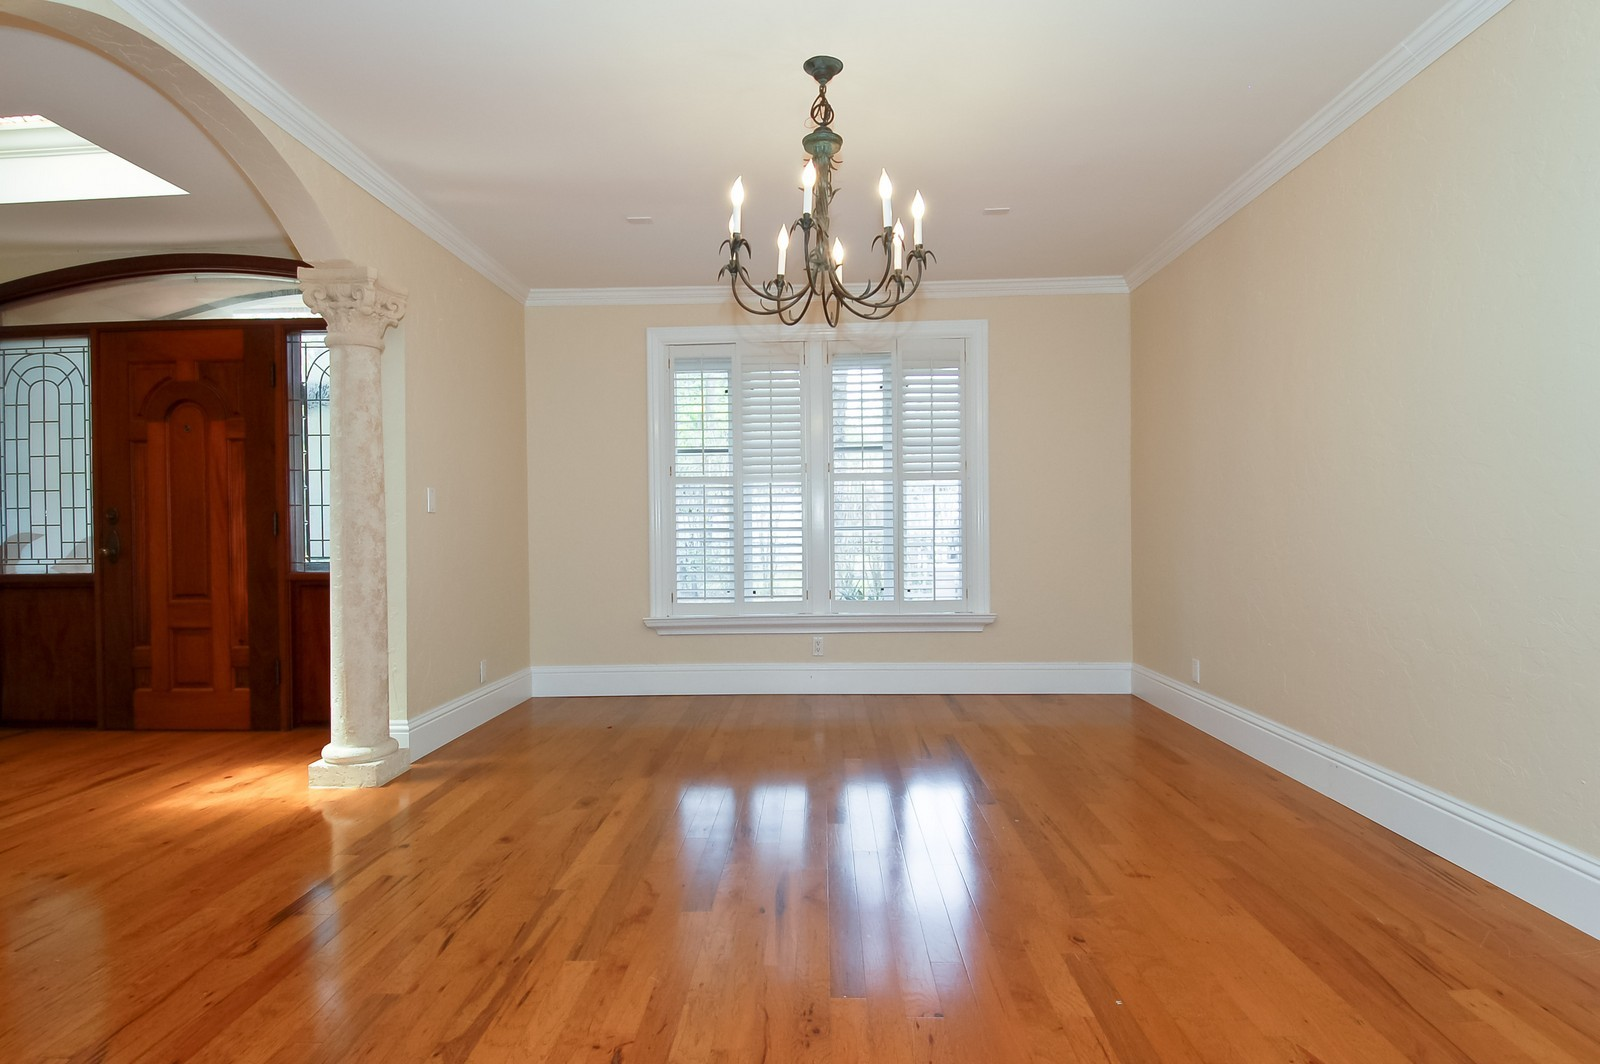 Real Estate Photography - 899 Azalea St, Boca Raton, FL, 33486 - Dining Room